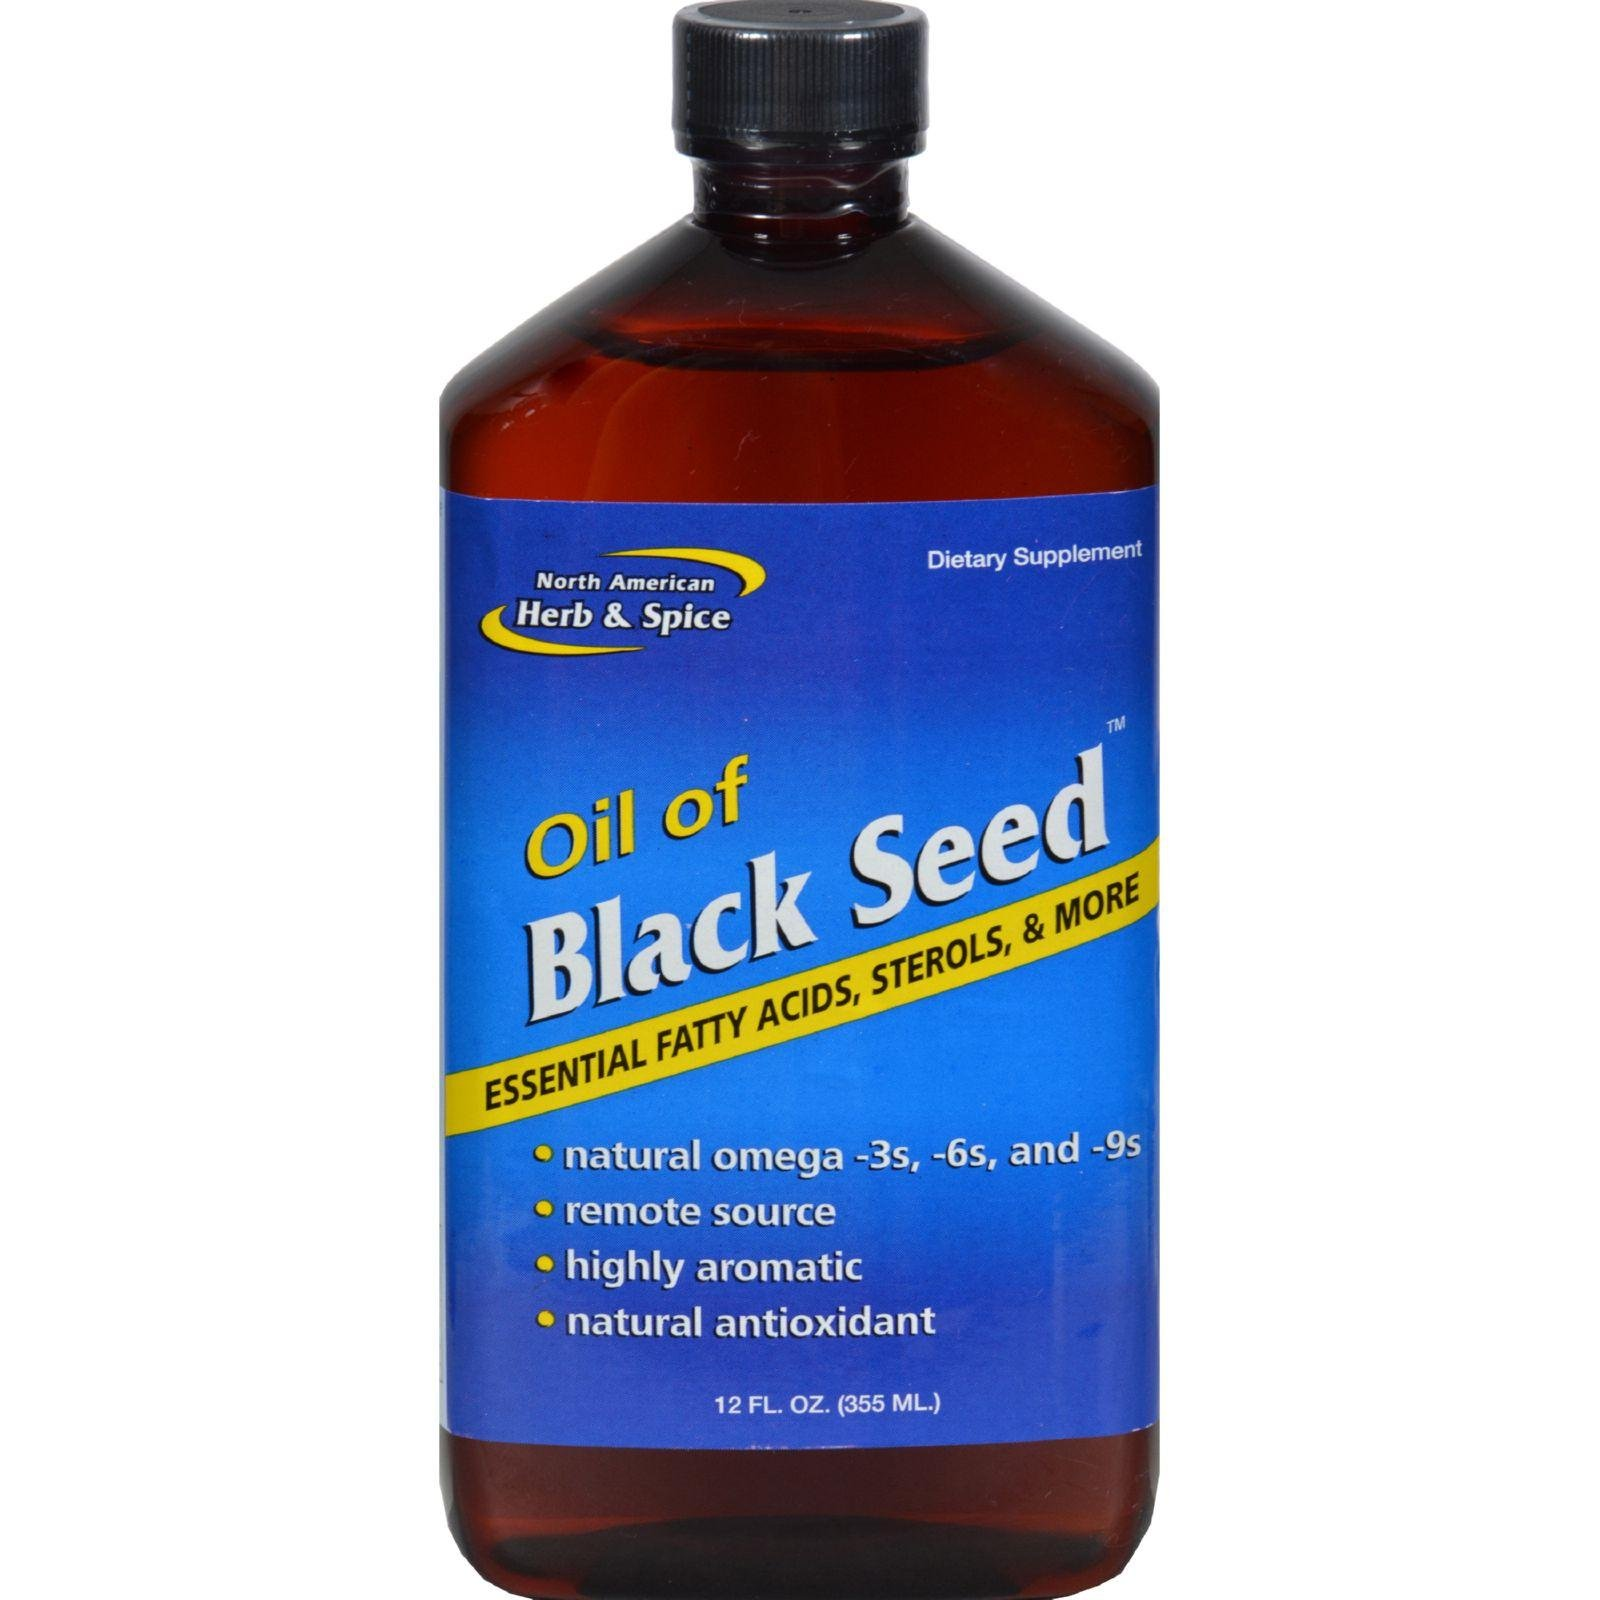 North American Herb & Spice, Black Seed Oil, 12 Fl Oz